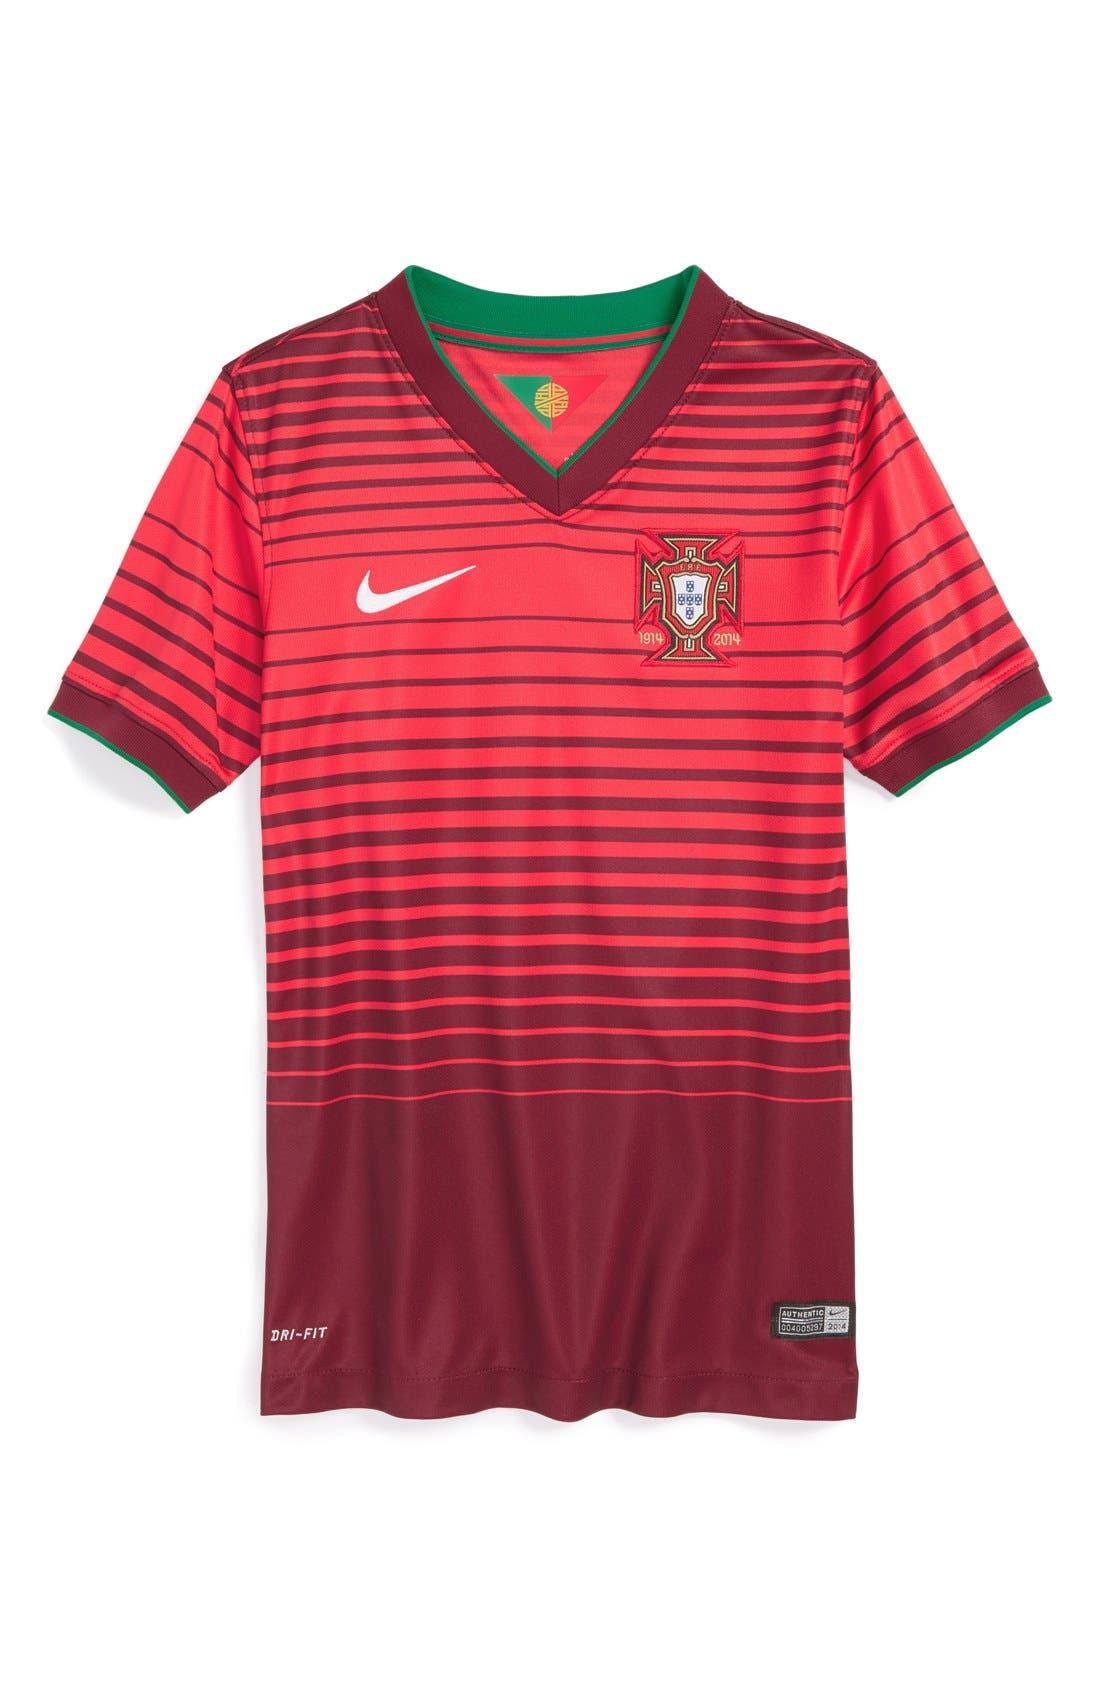 Main Image - Nike 'Portugal - 2014 Stadium' Dri-FIT World Soccer Jersey (Big Boys)